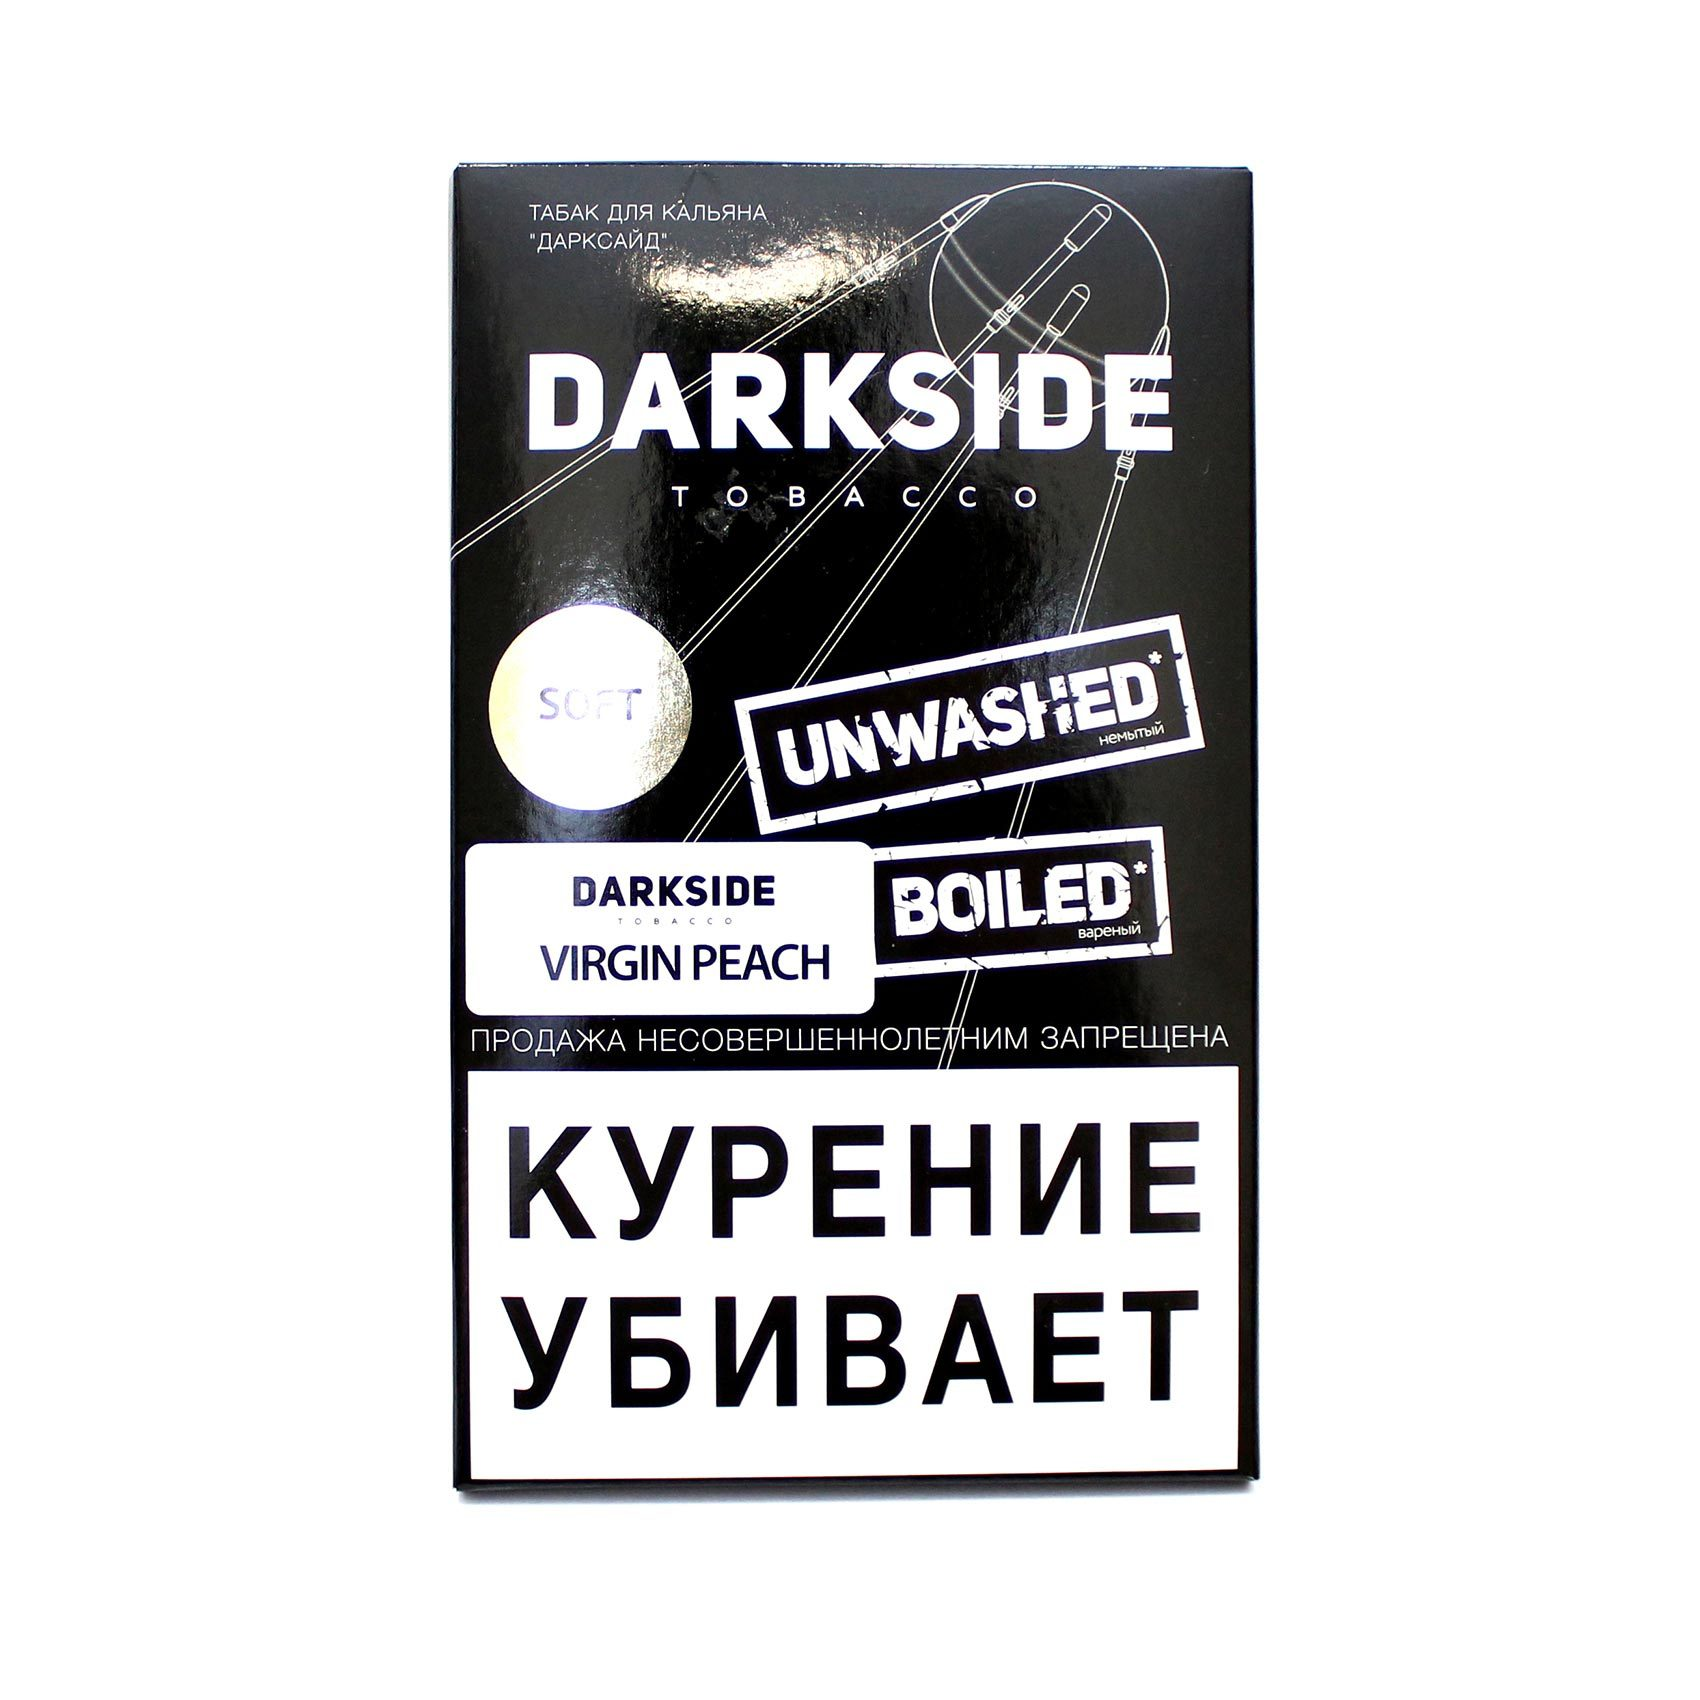 Табак для кальяна Dark Side Soft 100 гр. Virgin Peach